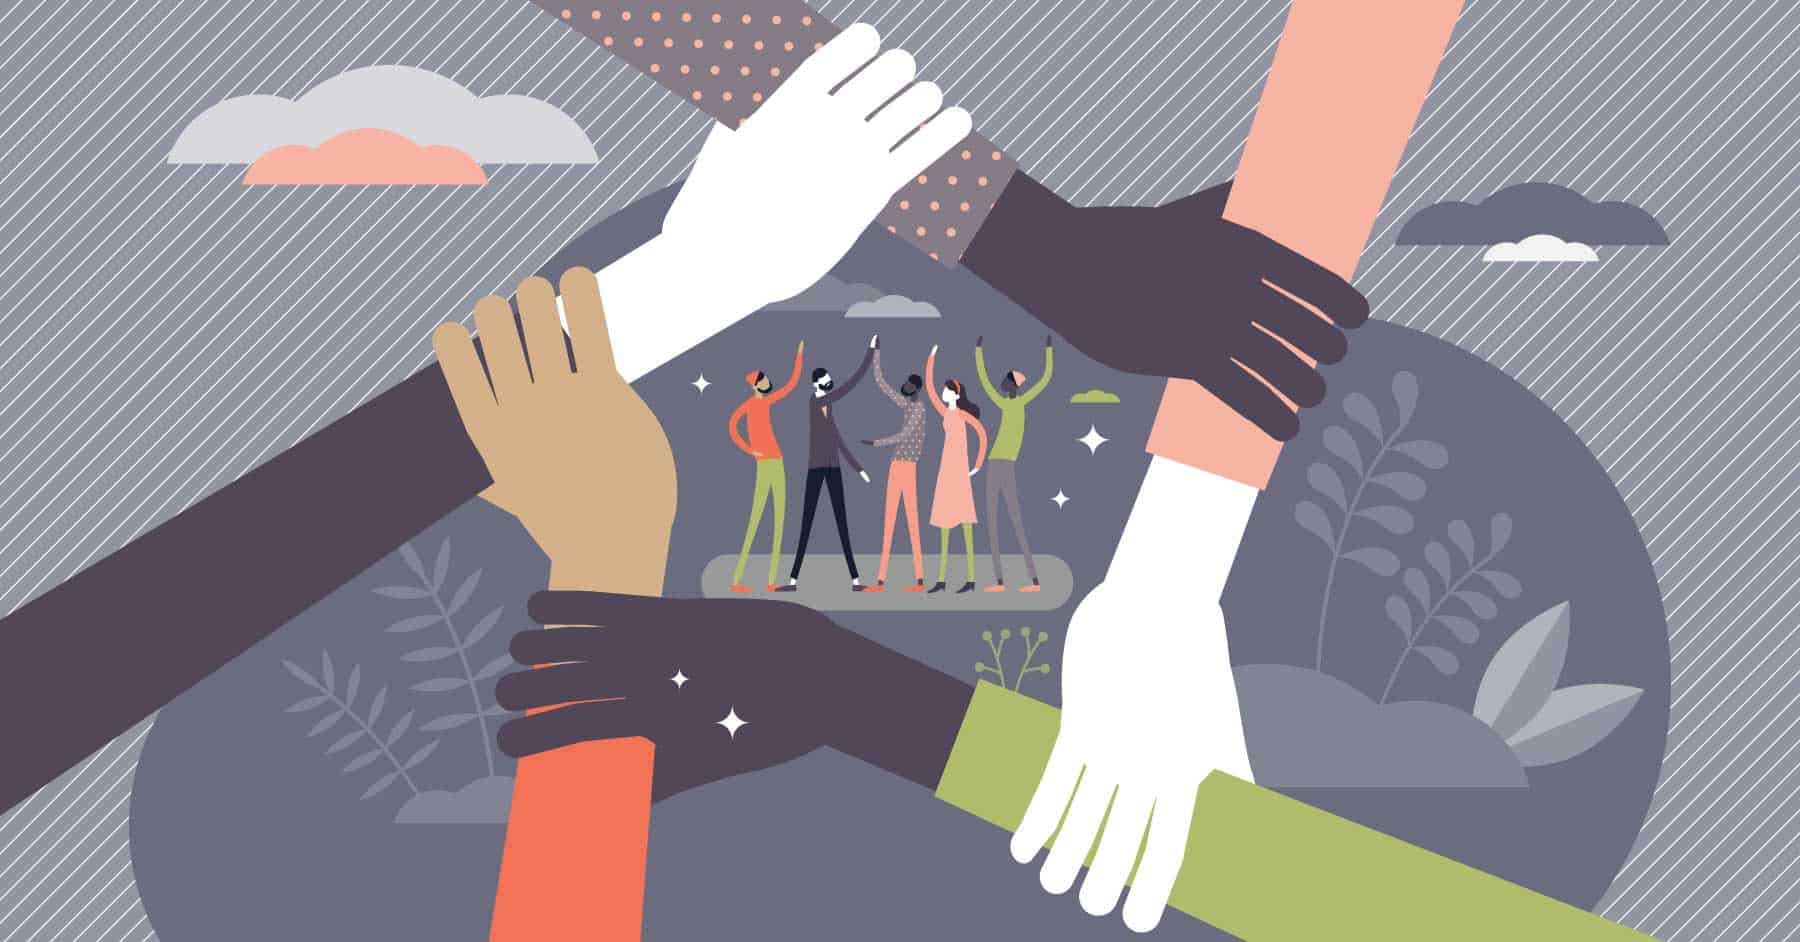 Buildng strong communities